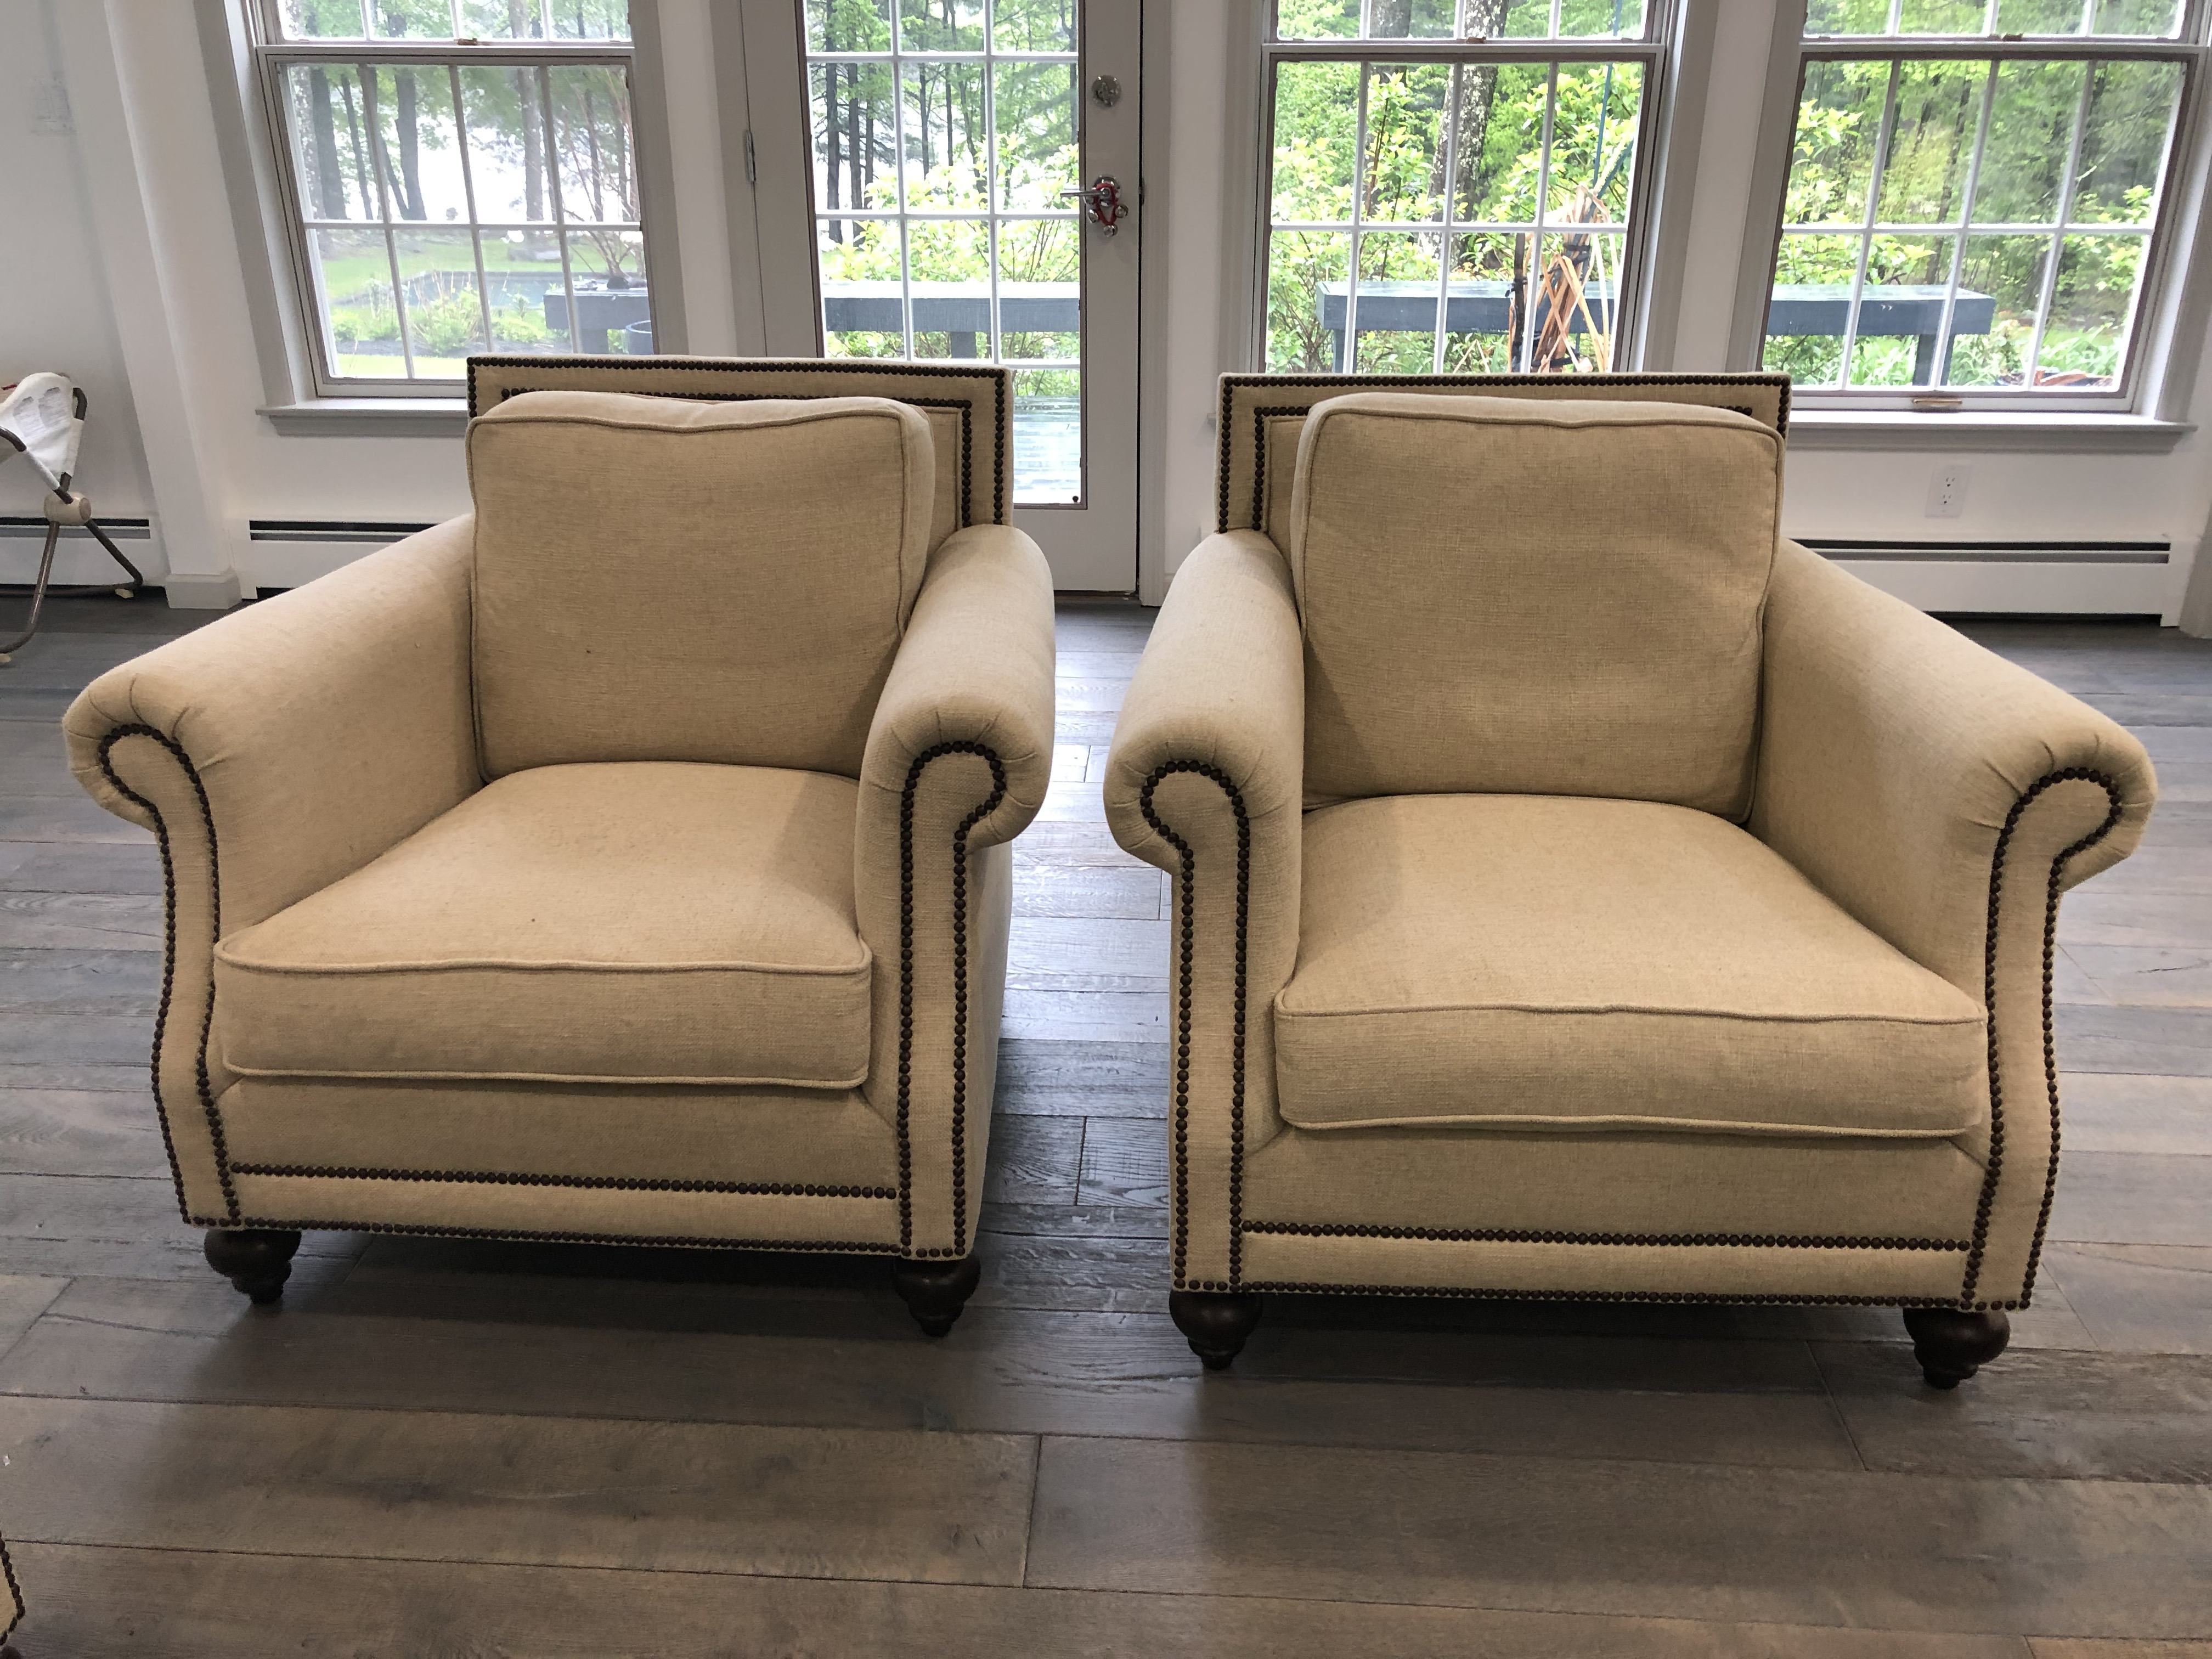 Safavieh Brae Bernhardt Sofa And Armchairs   3 Pc. Set   Image 3 Of 11